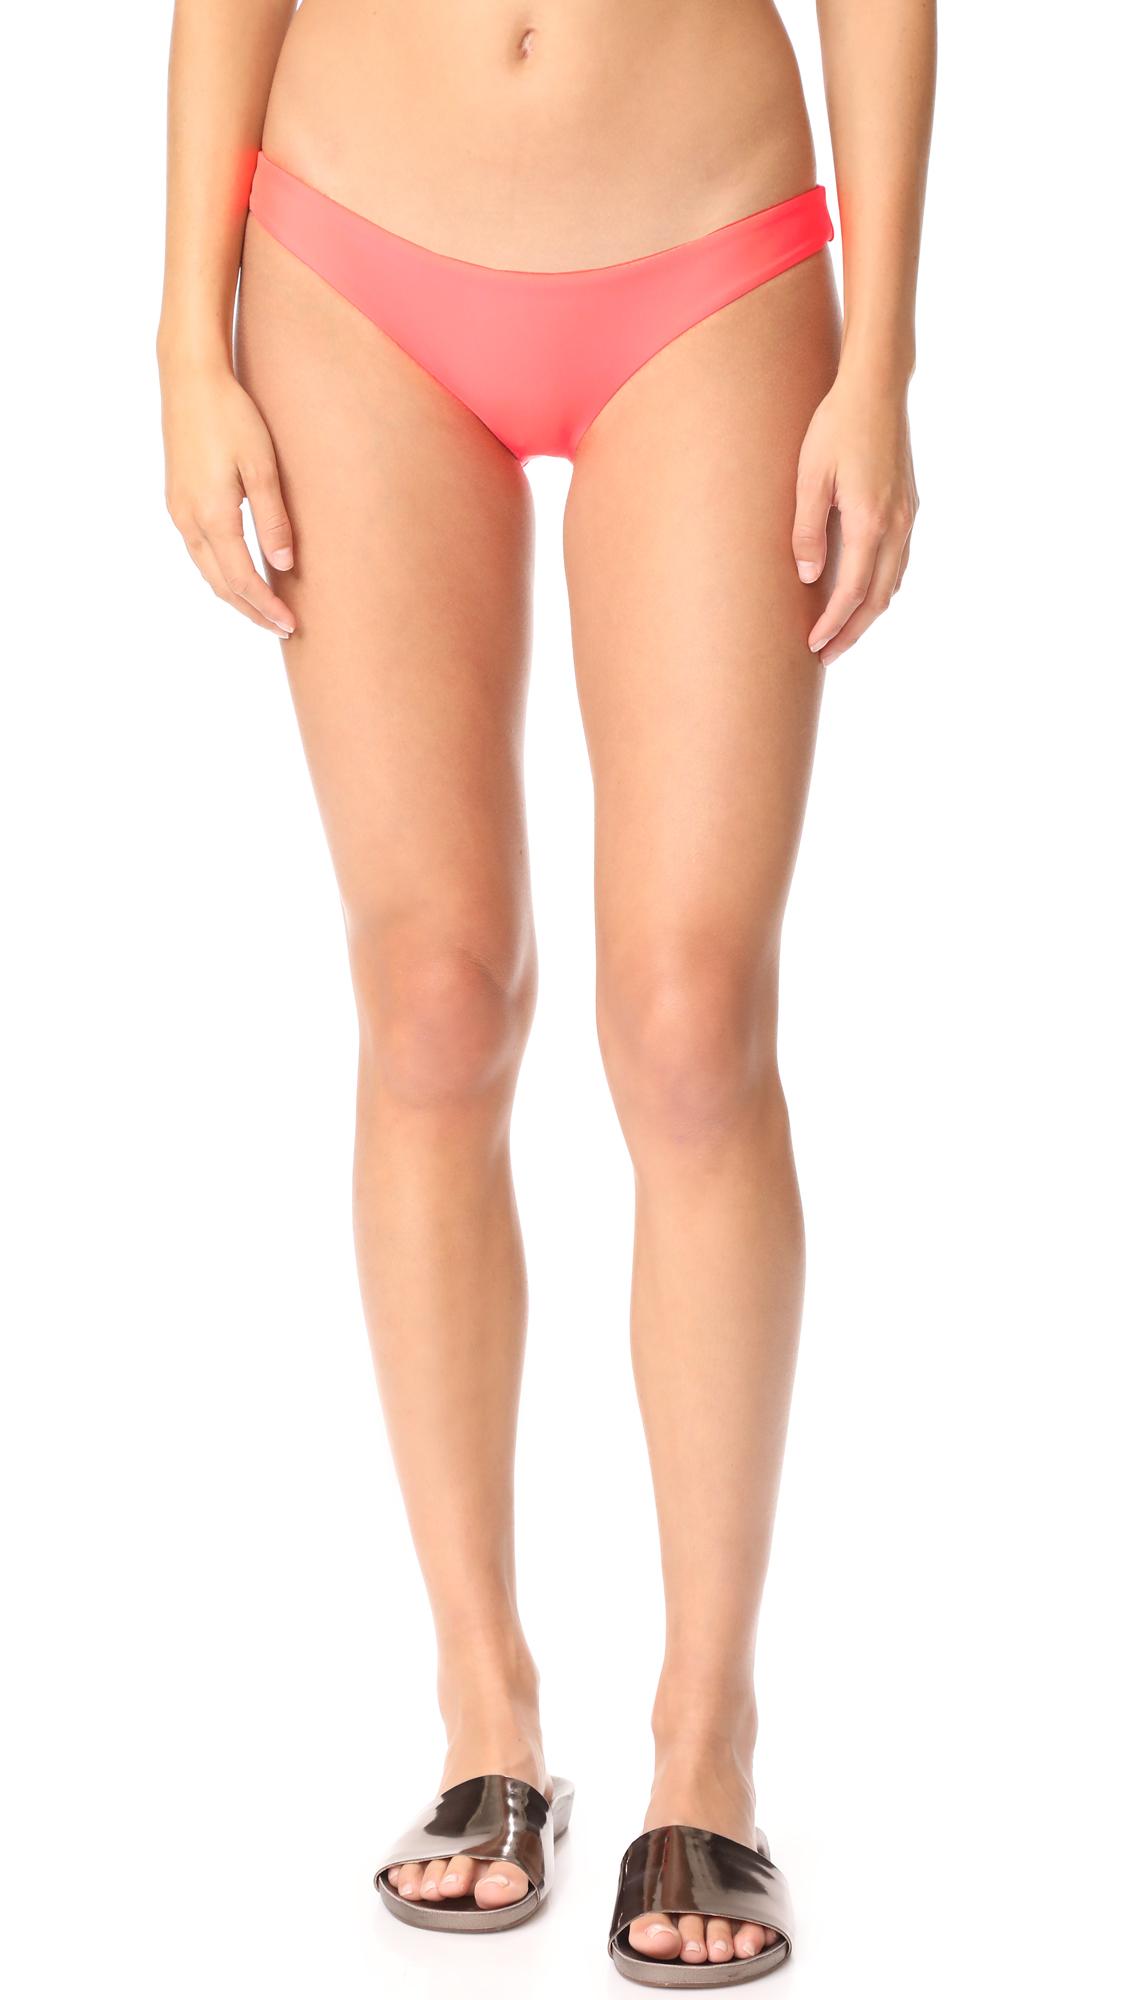 Baja East Bikini Bottoms - Granatina